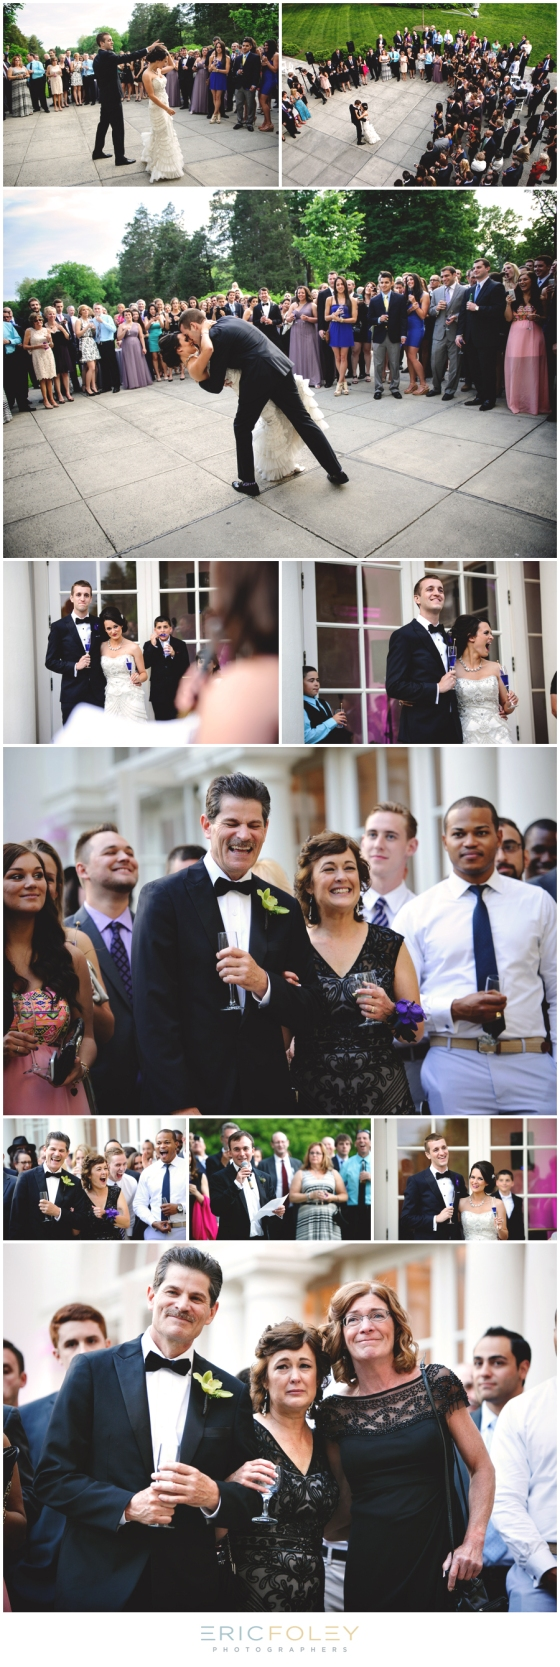 0015_Wadsworth-Mansion-Weddings_Eric-Foley-Photography_DJ